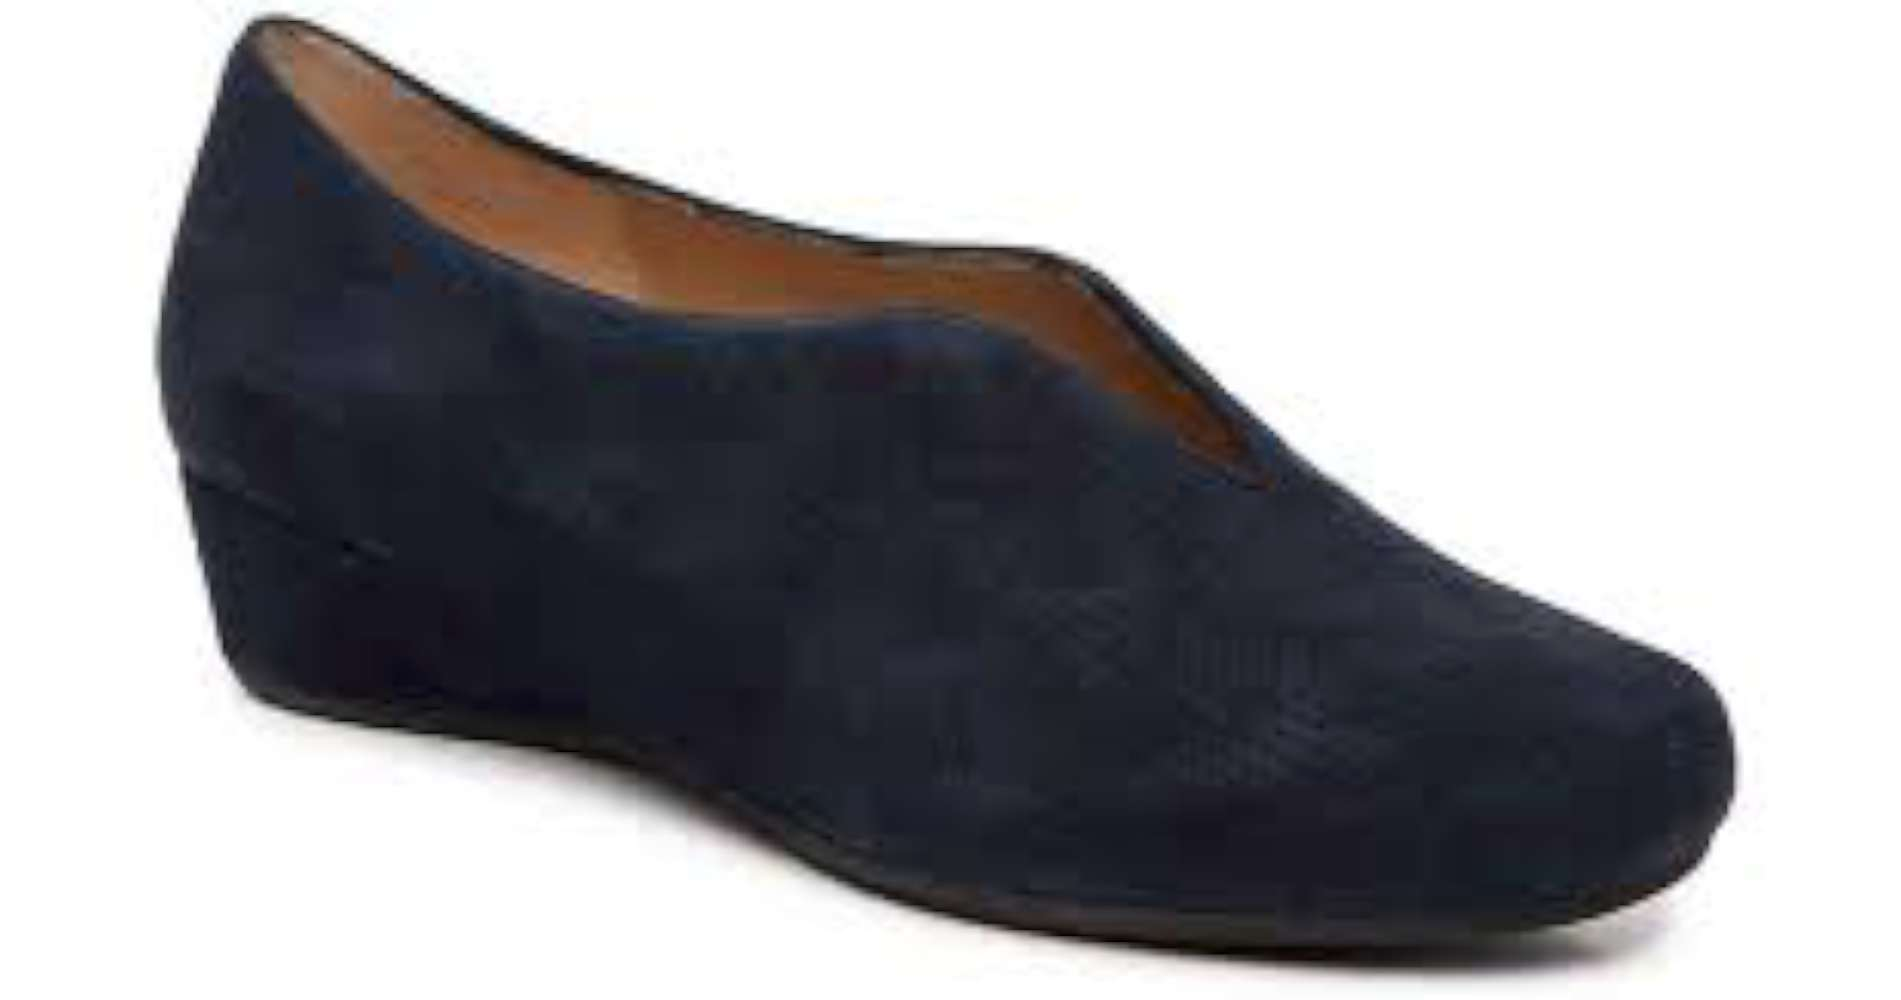 VANELi Womens madix Leather Closed Toe Wedge Pumps Blue Size 11.0